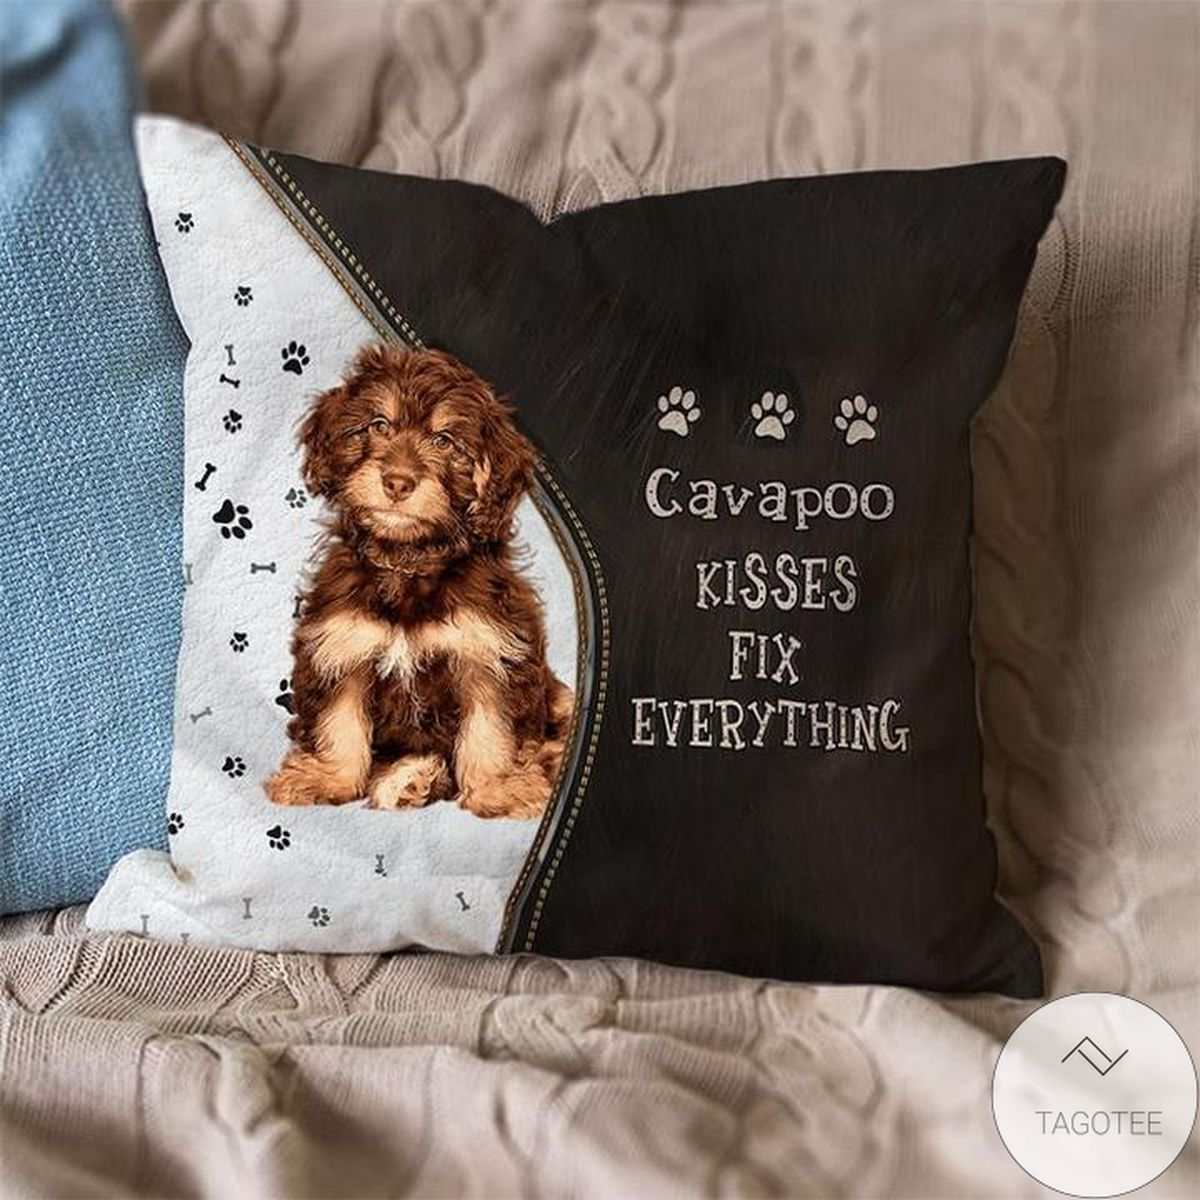 3D Cavapoo Kisses Fix Everything Pillowcase